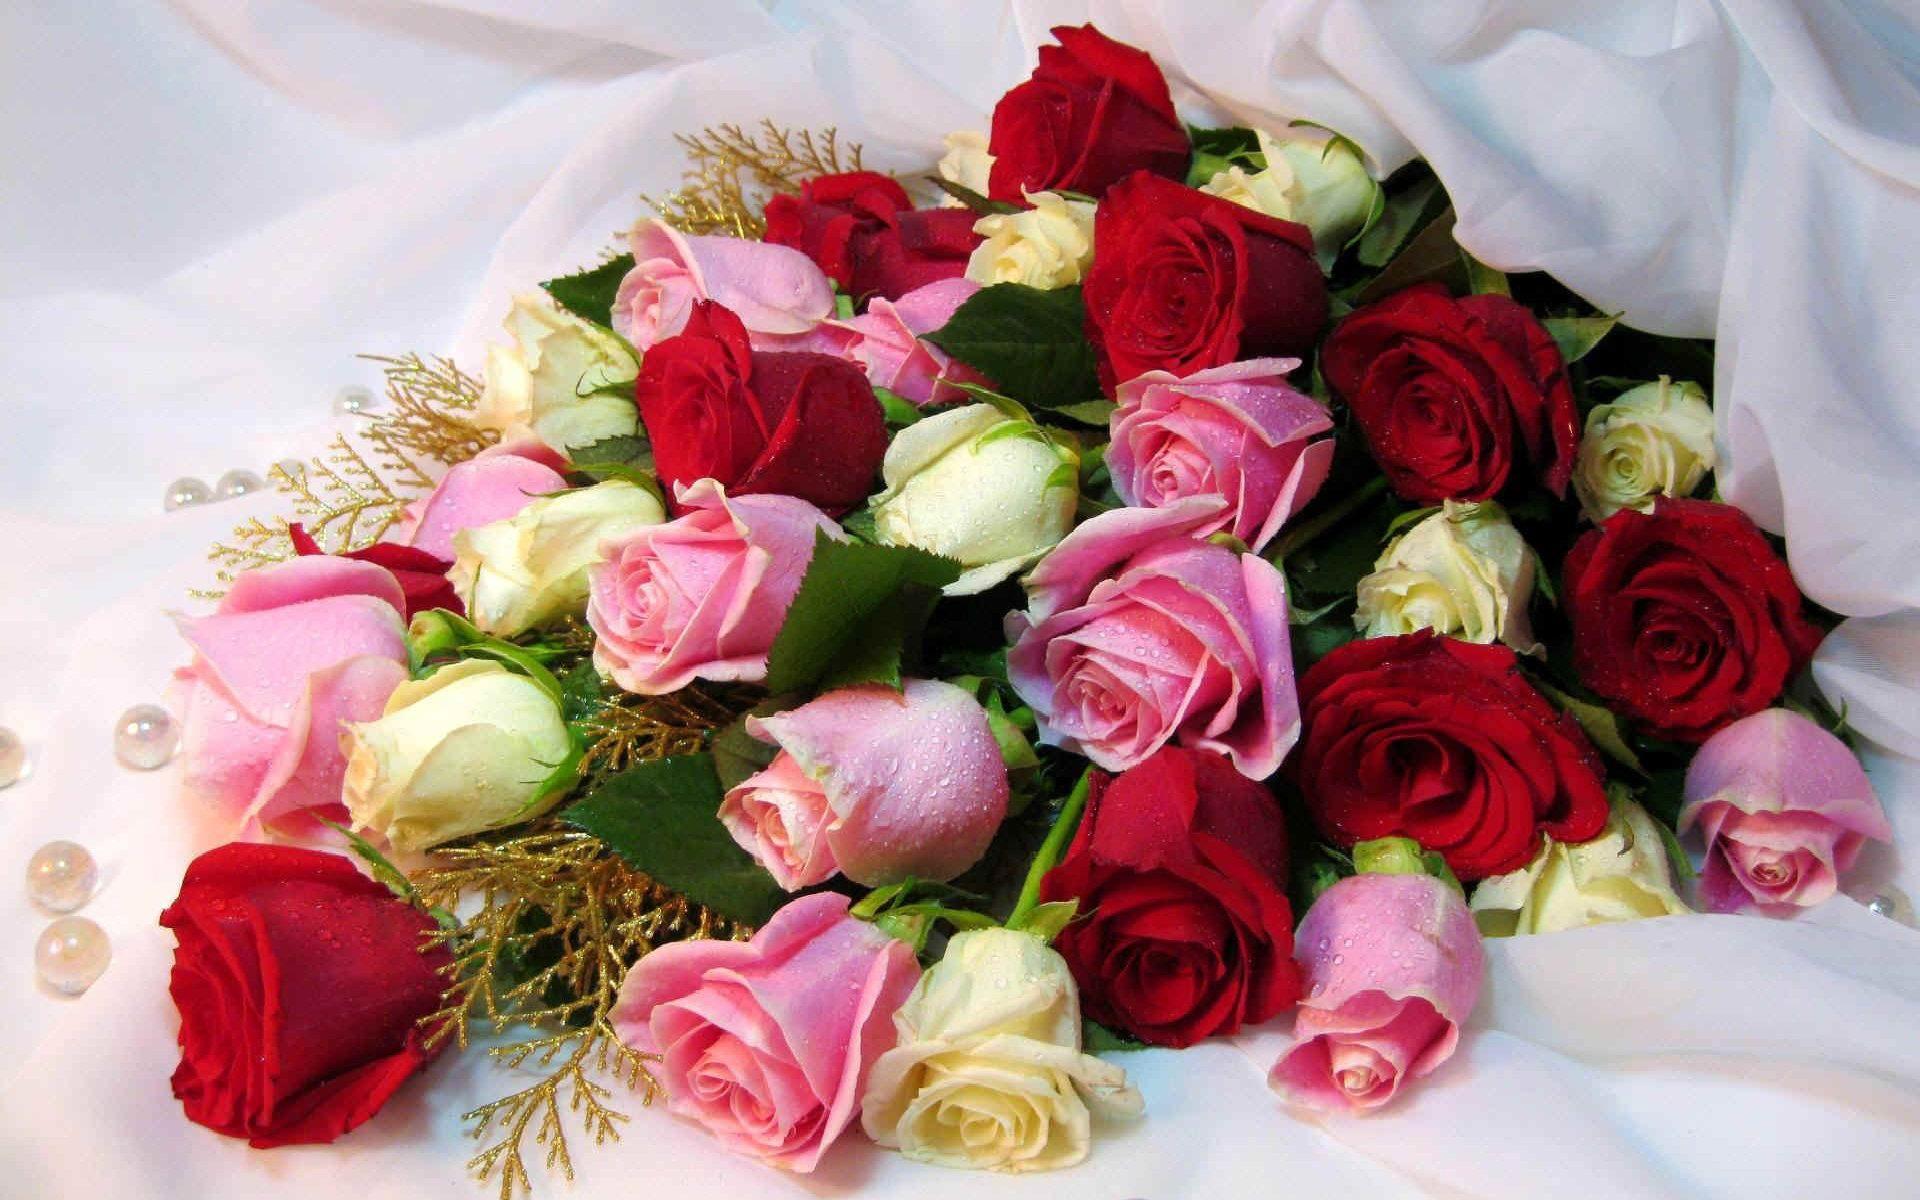 Rose Wallpaper Free e Plans Ideas Picture